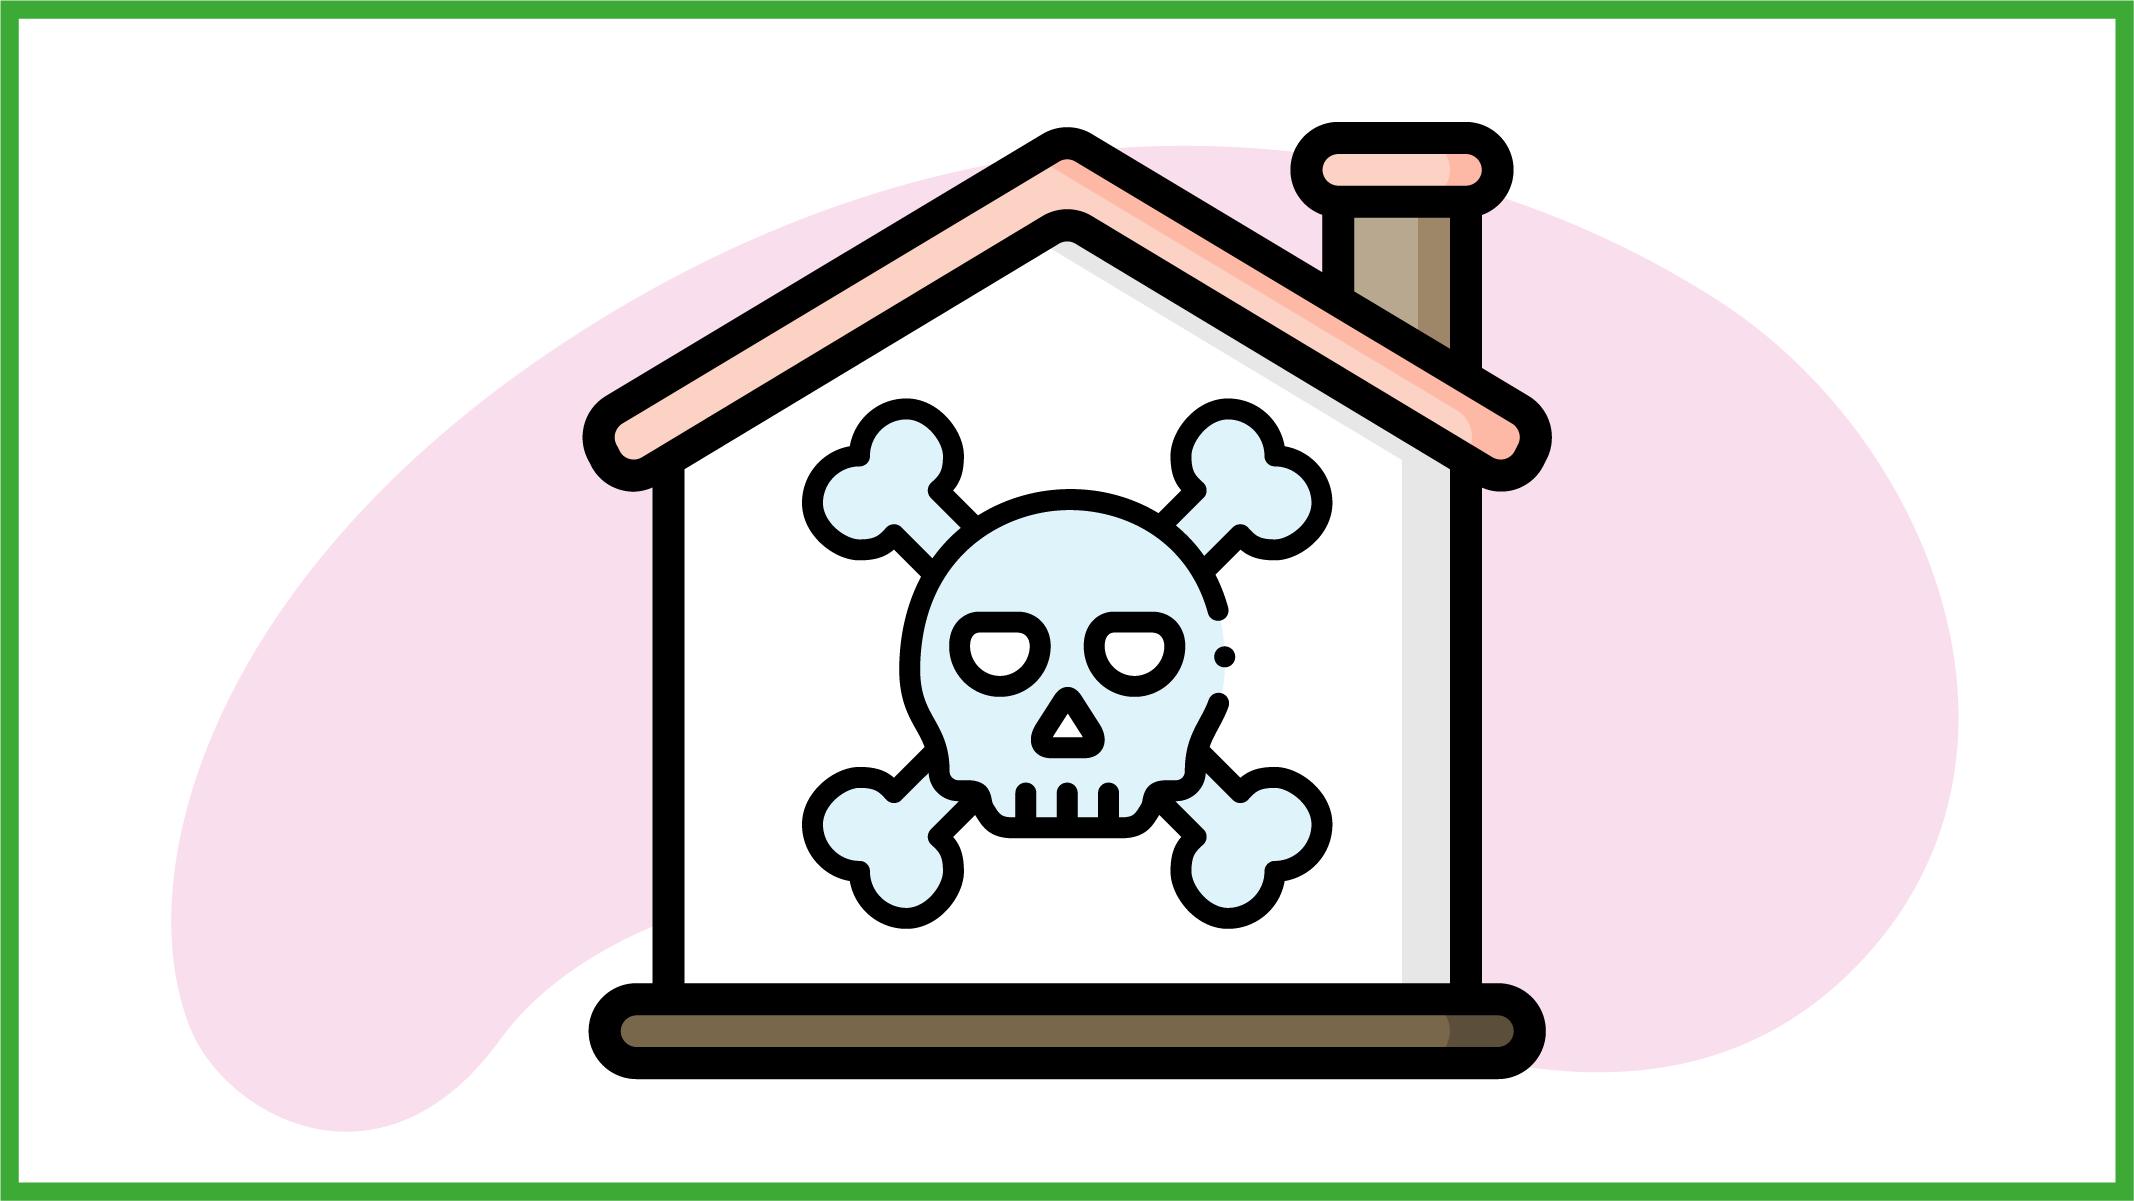 abitazione inquinata